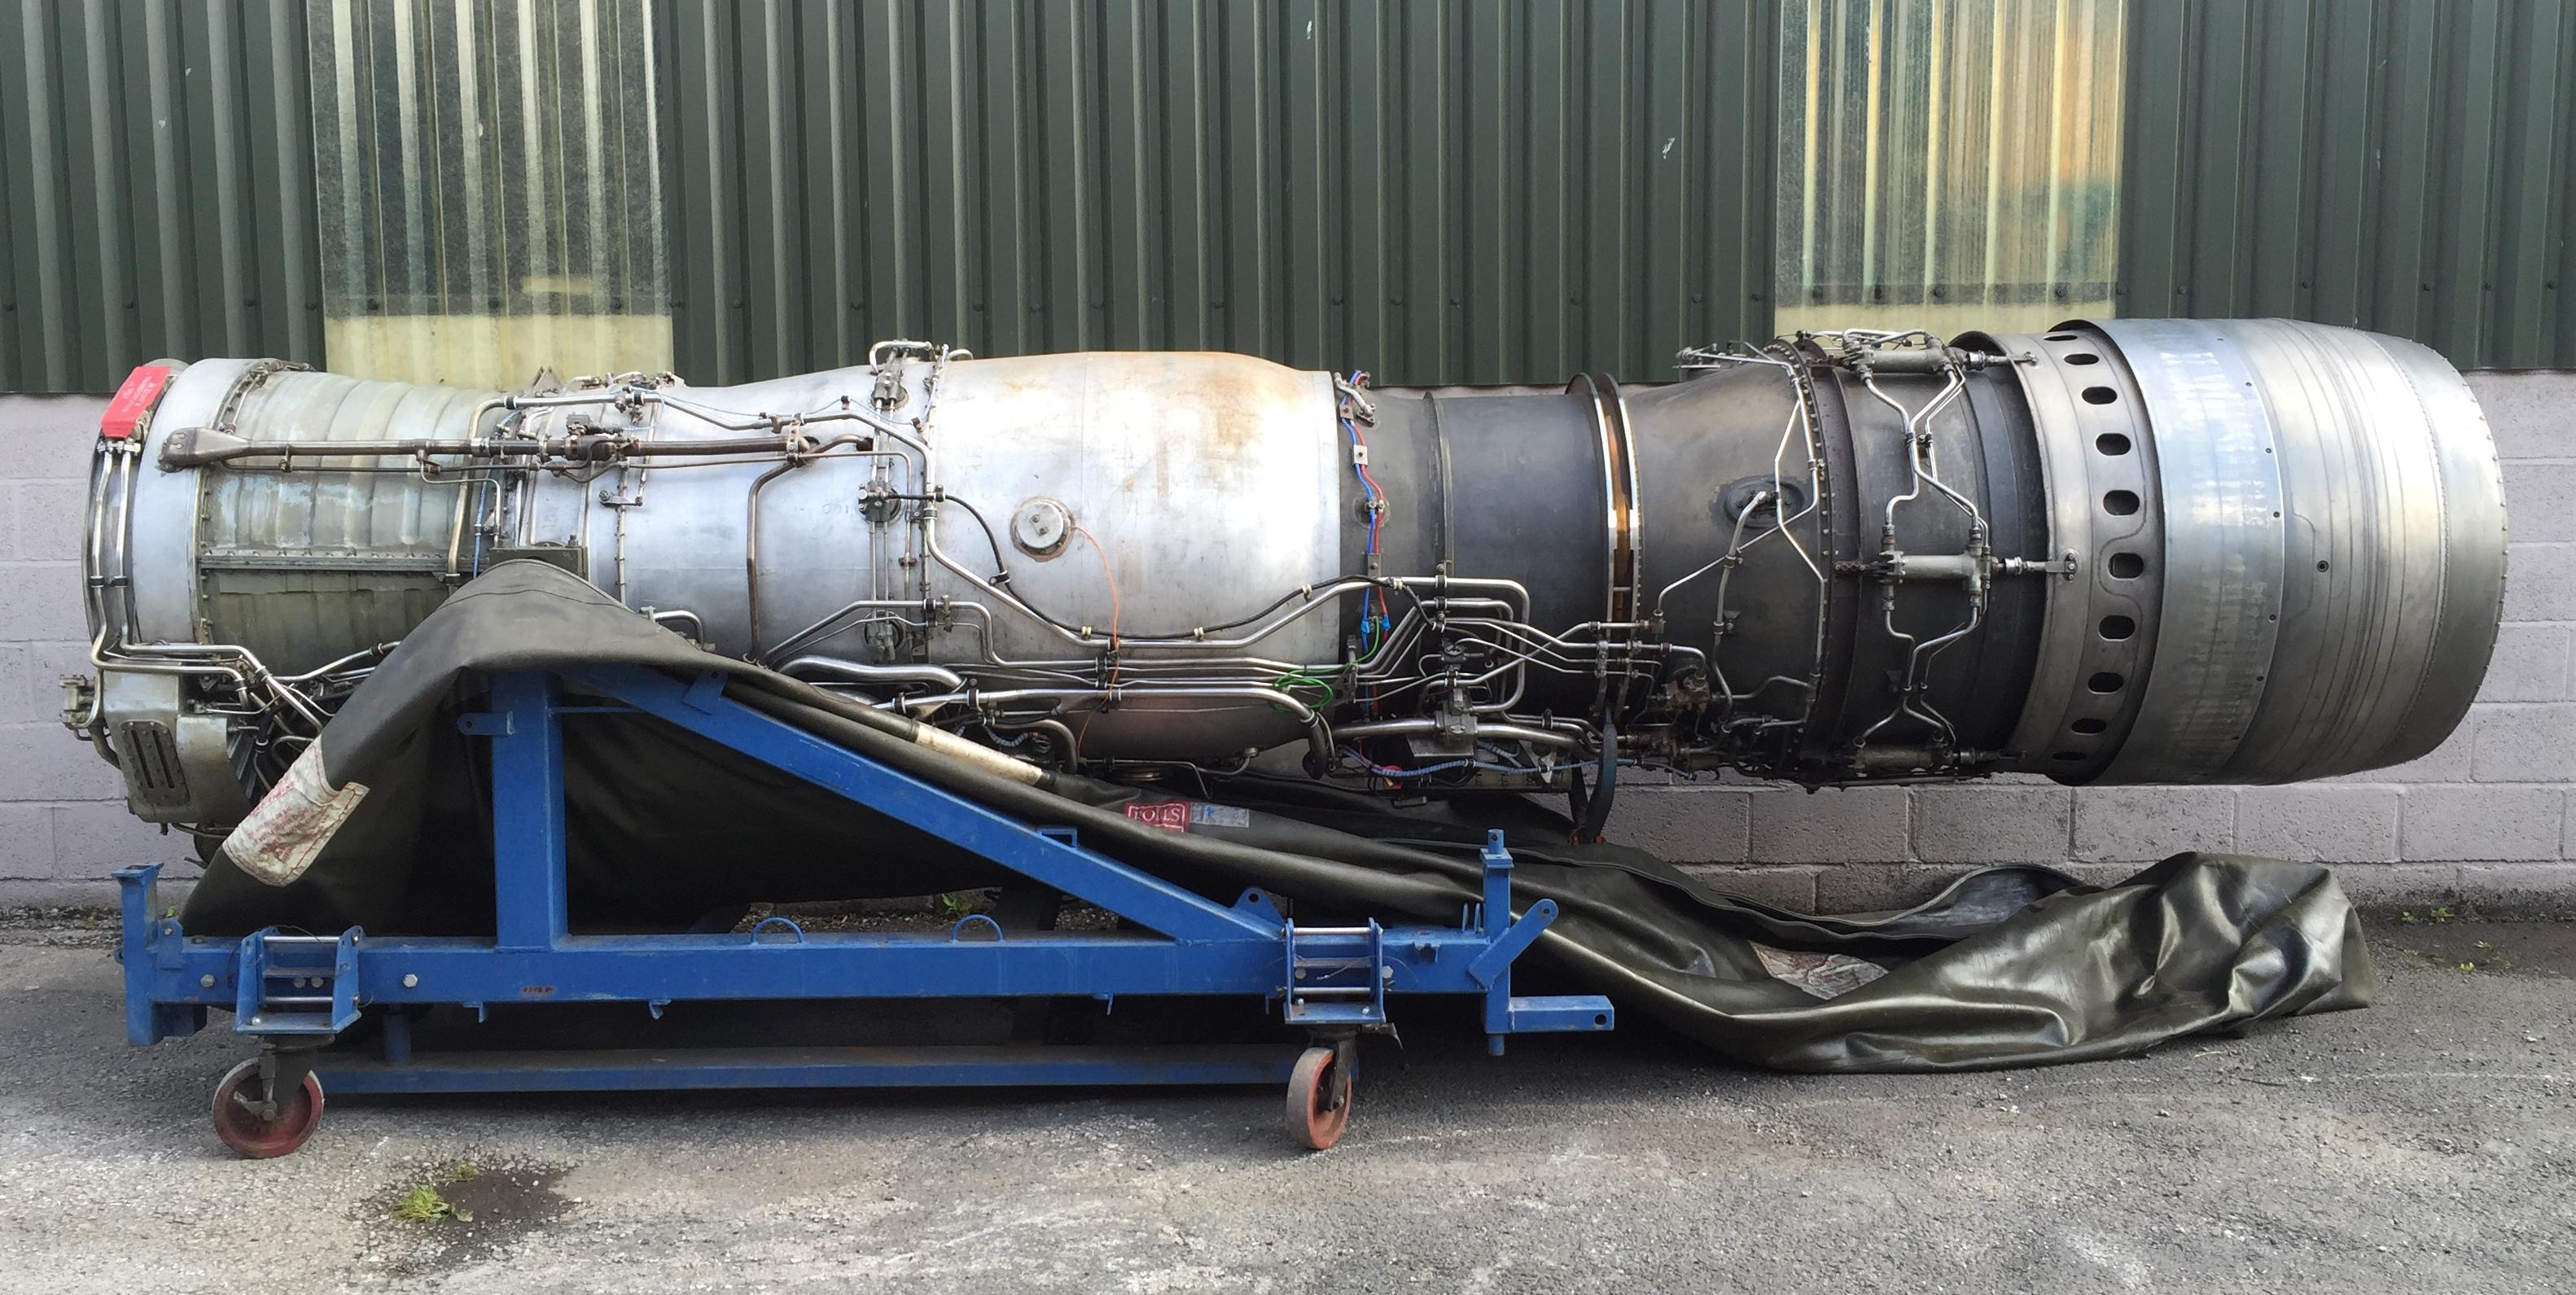 Rolls Royce spey 202 jet engine